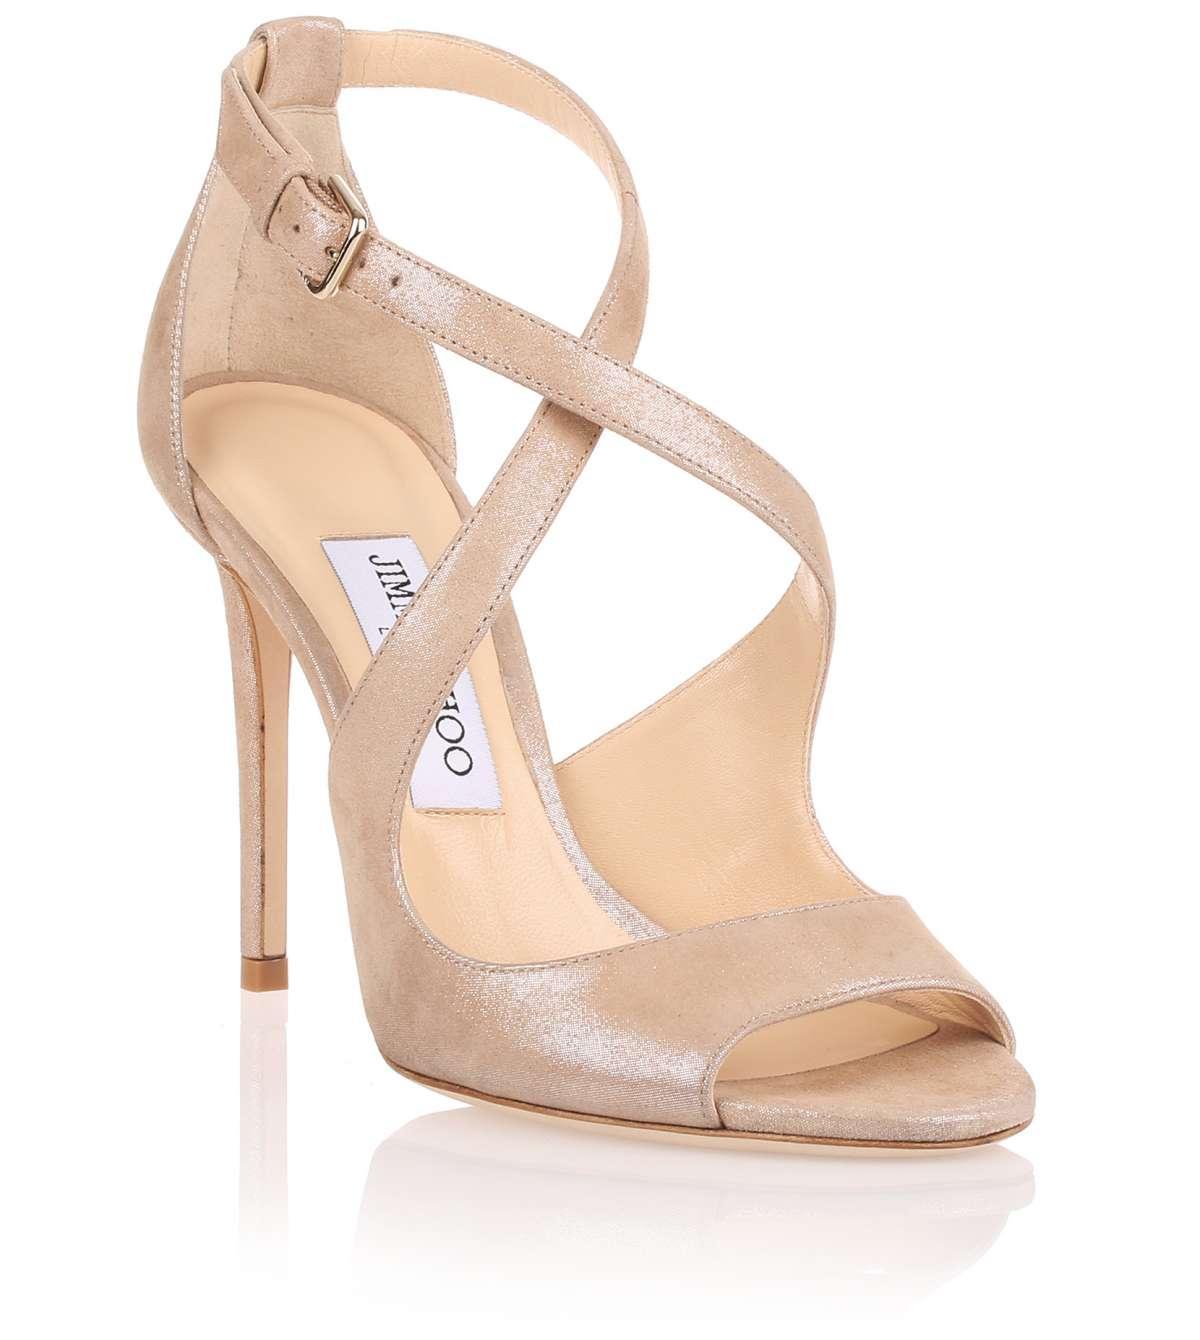 3e322d077b4 Lyst - Jimmy Choo Emily 100 Beige Shimmer Suede Sandal Us in Natural